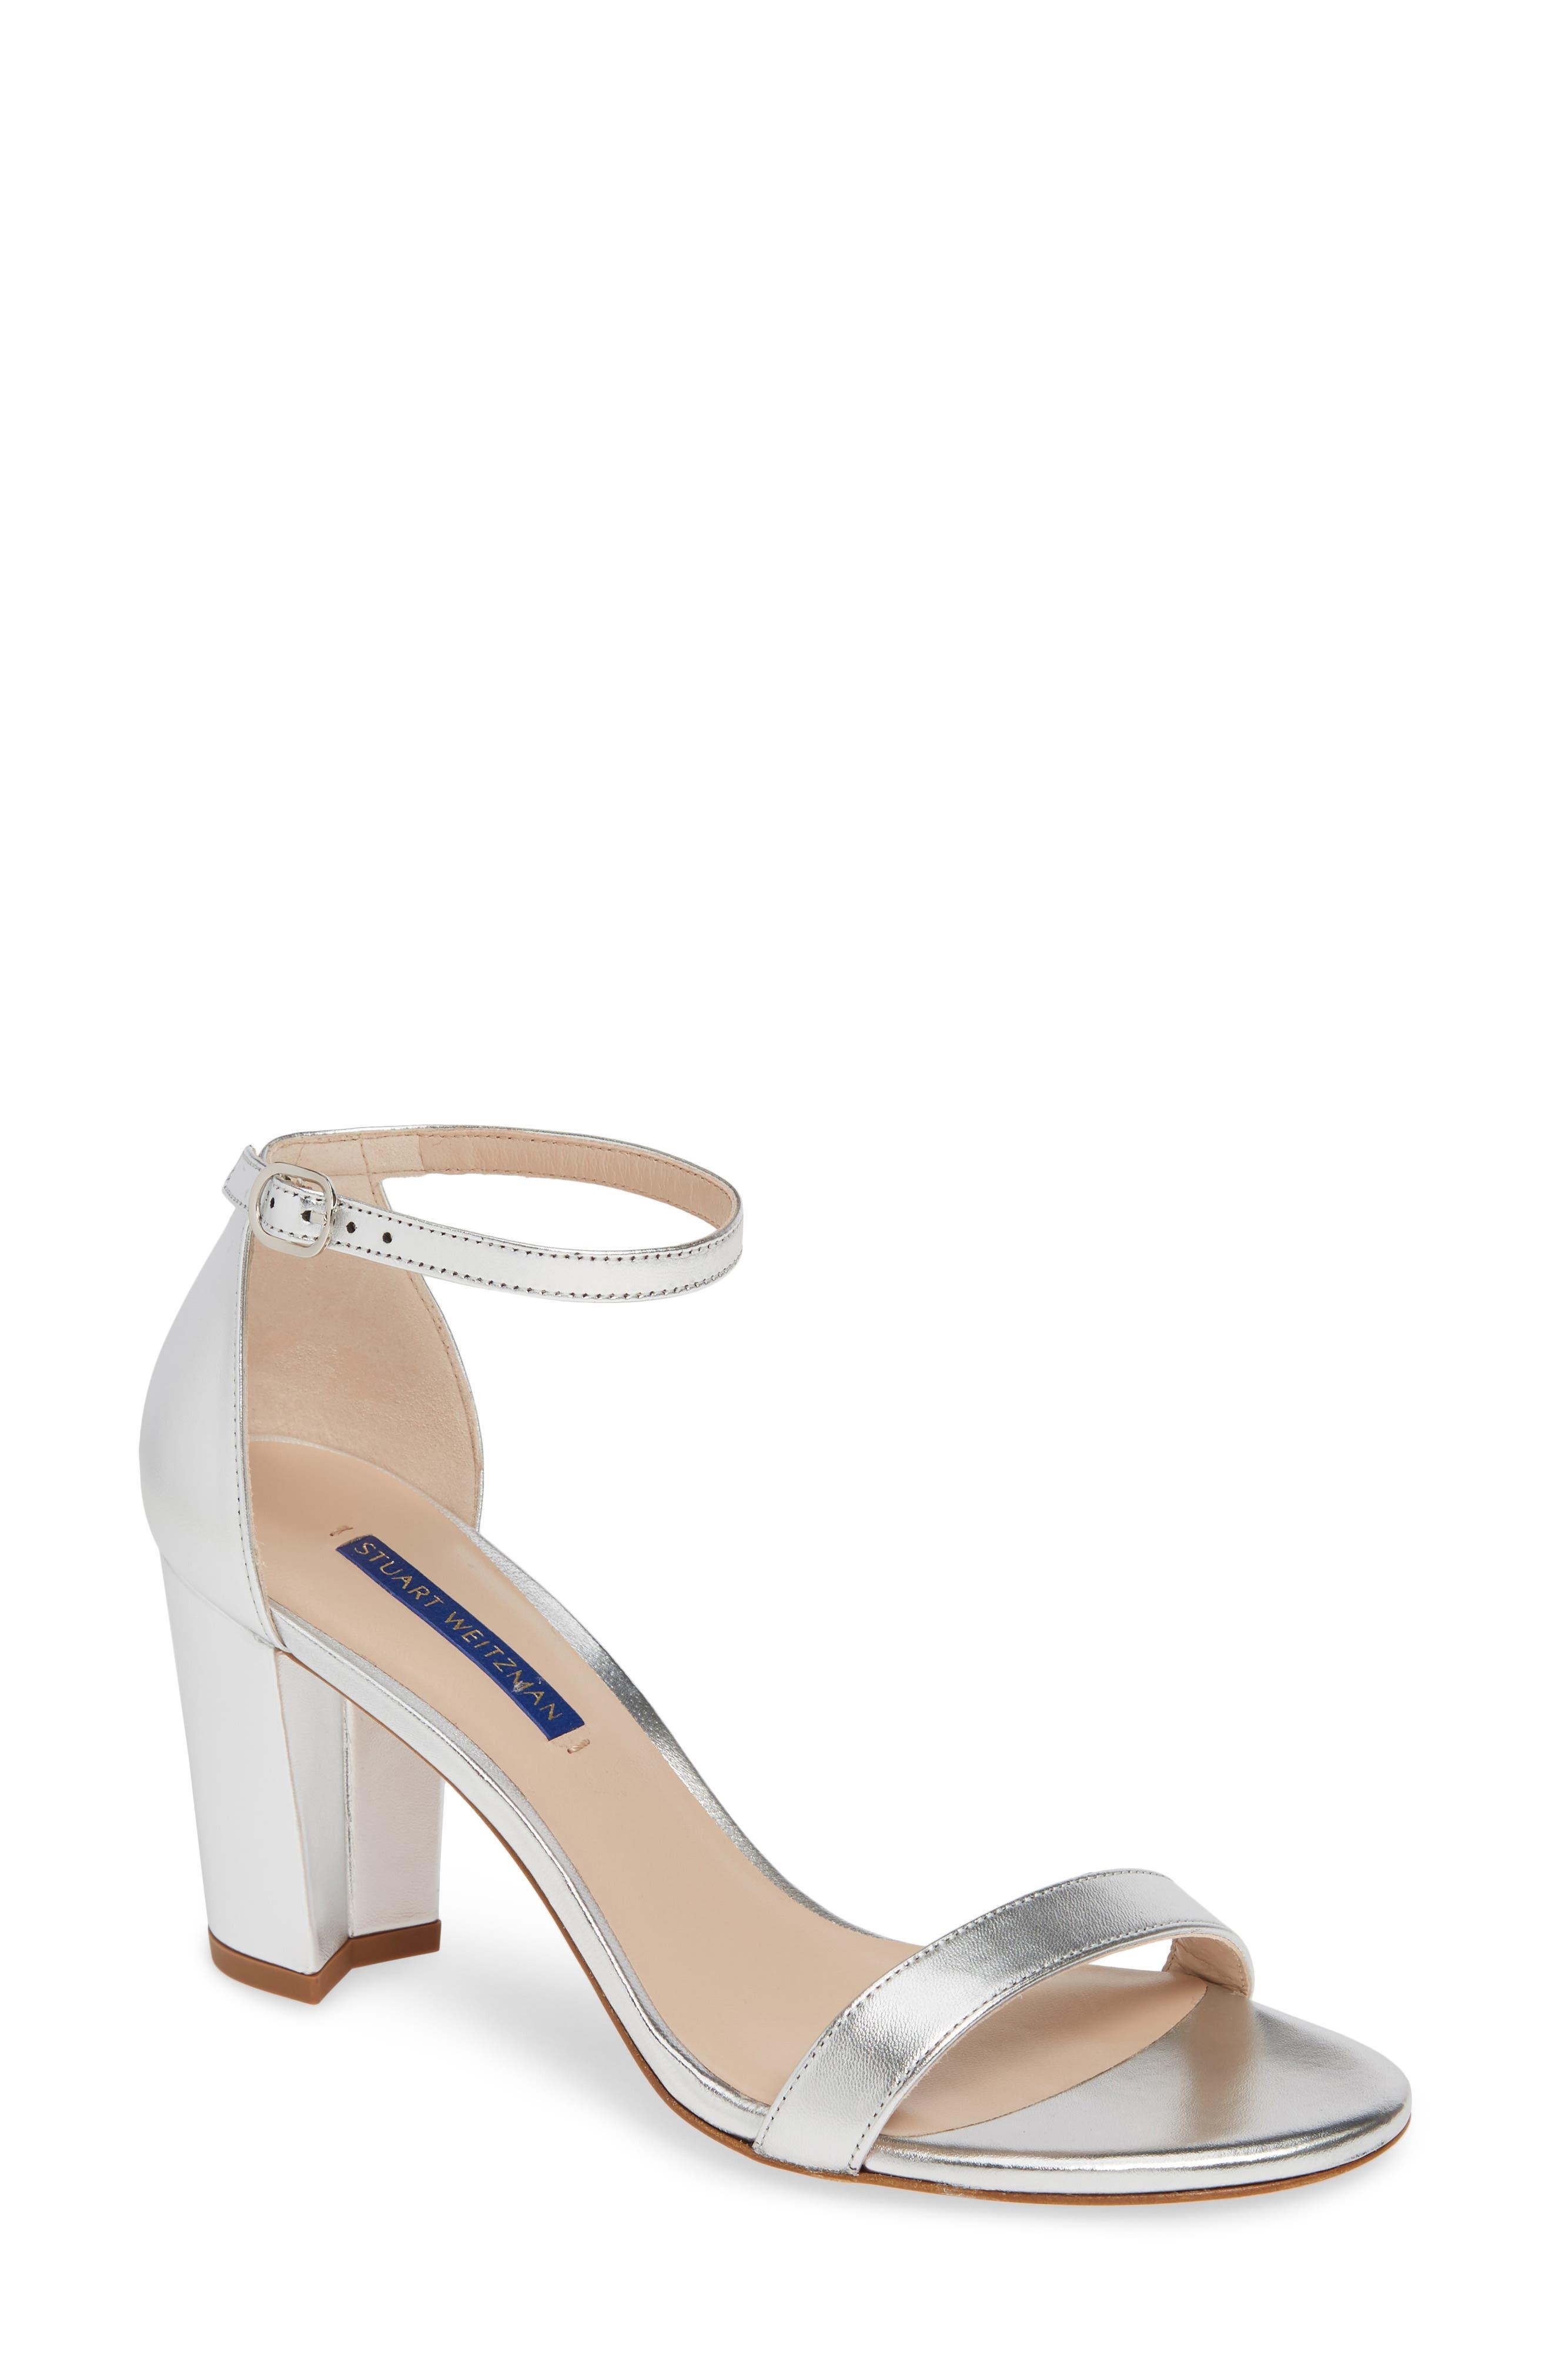 STUART WEITZMAN NearlyNude Ankle Strap Sandal, Main, color, SILVER METALLIC NAPPA